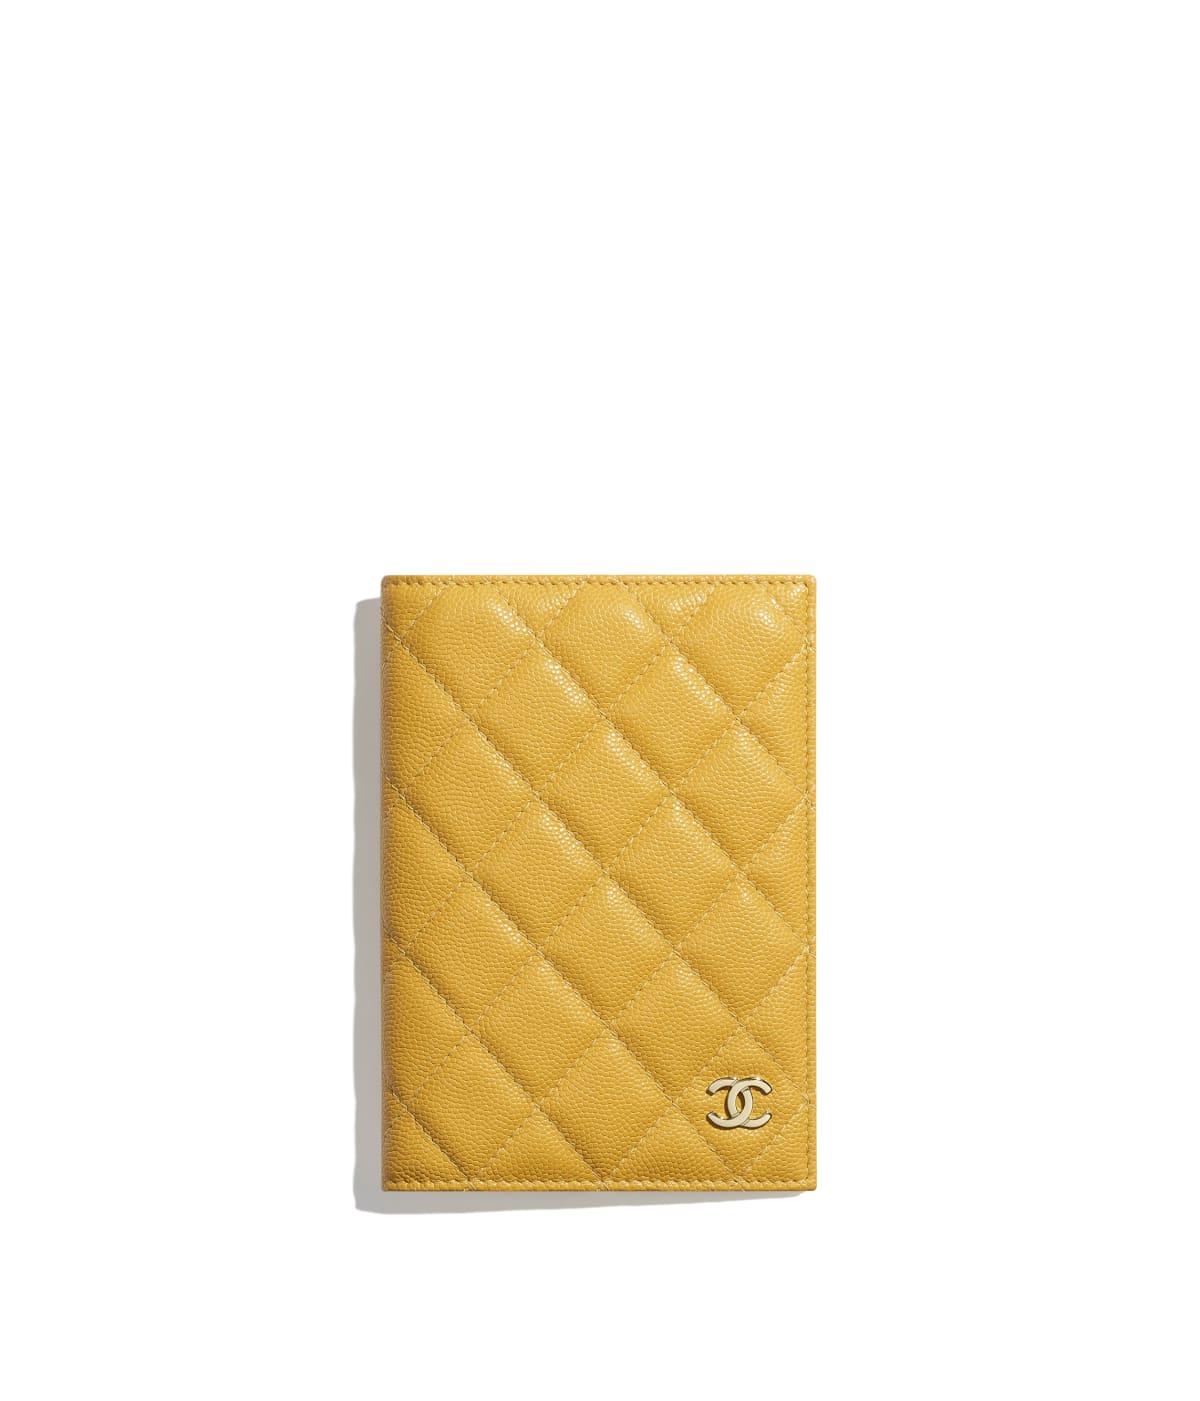 3bb44ab37eb4 Classic Passport Holder, grained calfskin & gold-tone metal, yellow - CHANEL